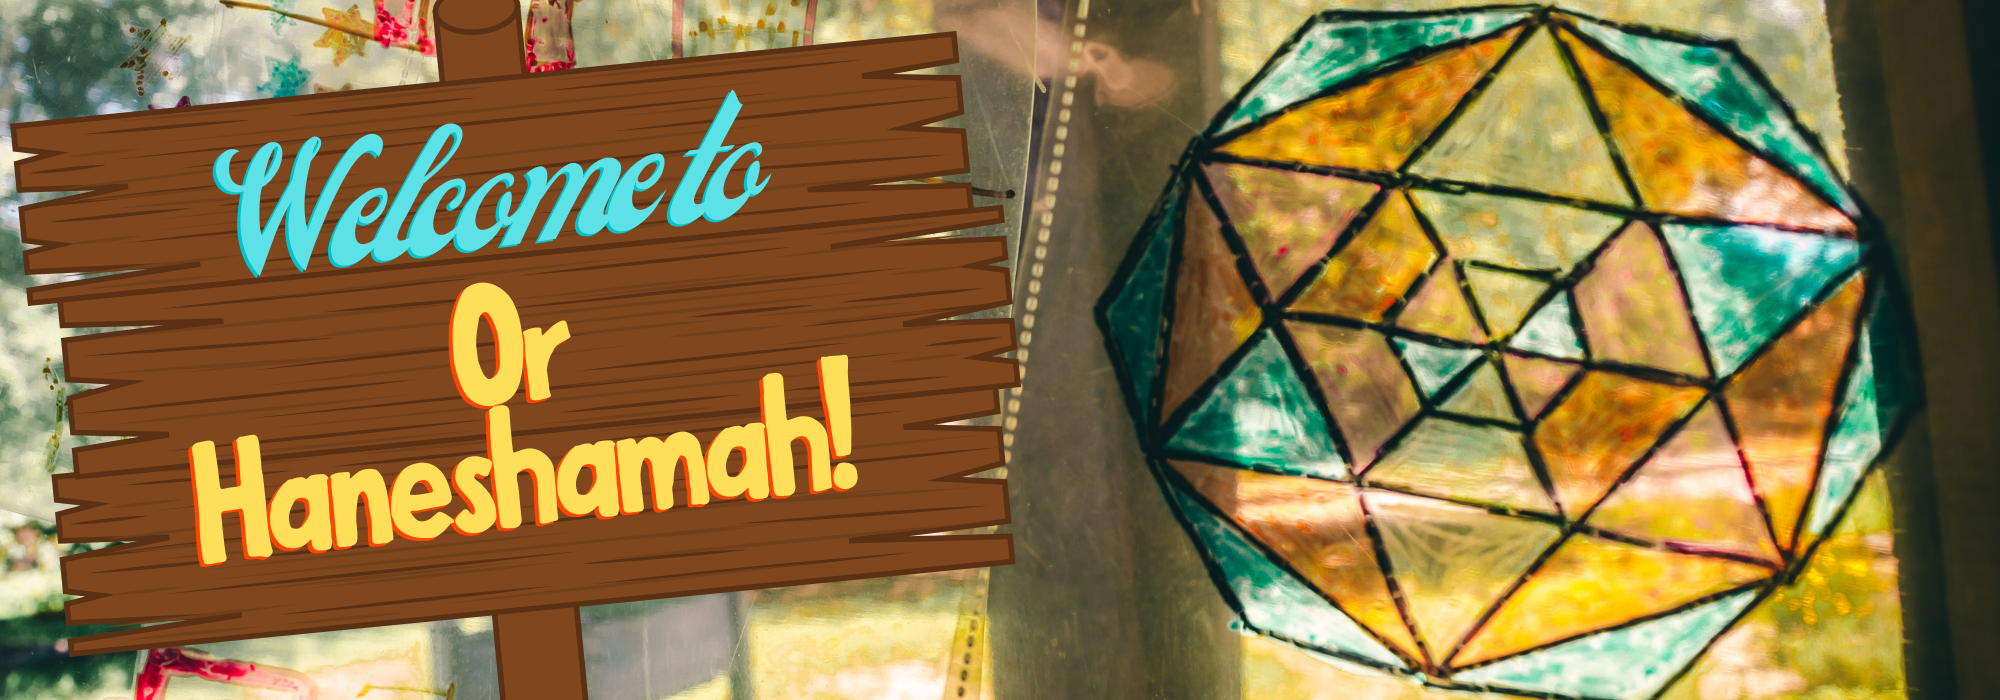 Welcome to Or Haneshamah!